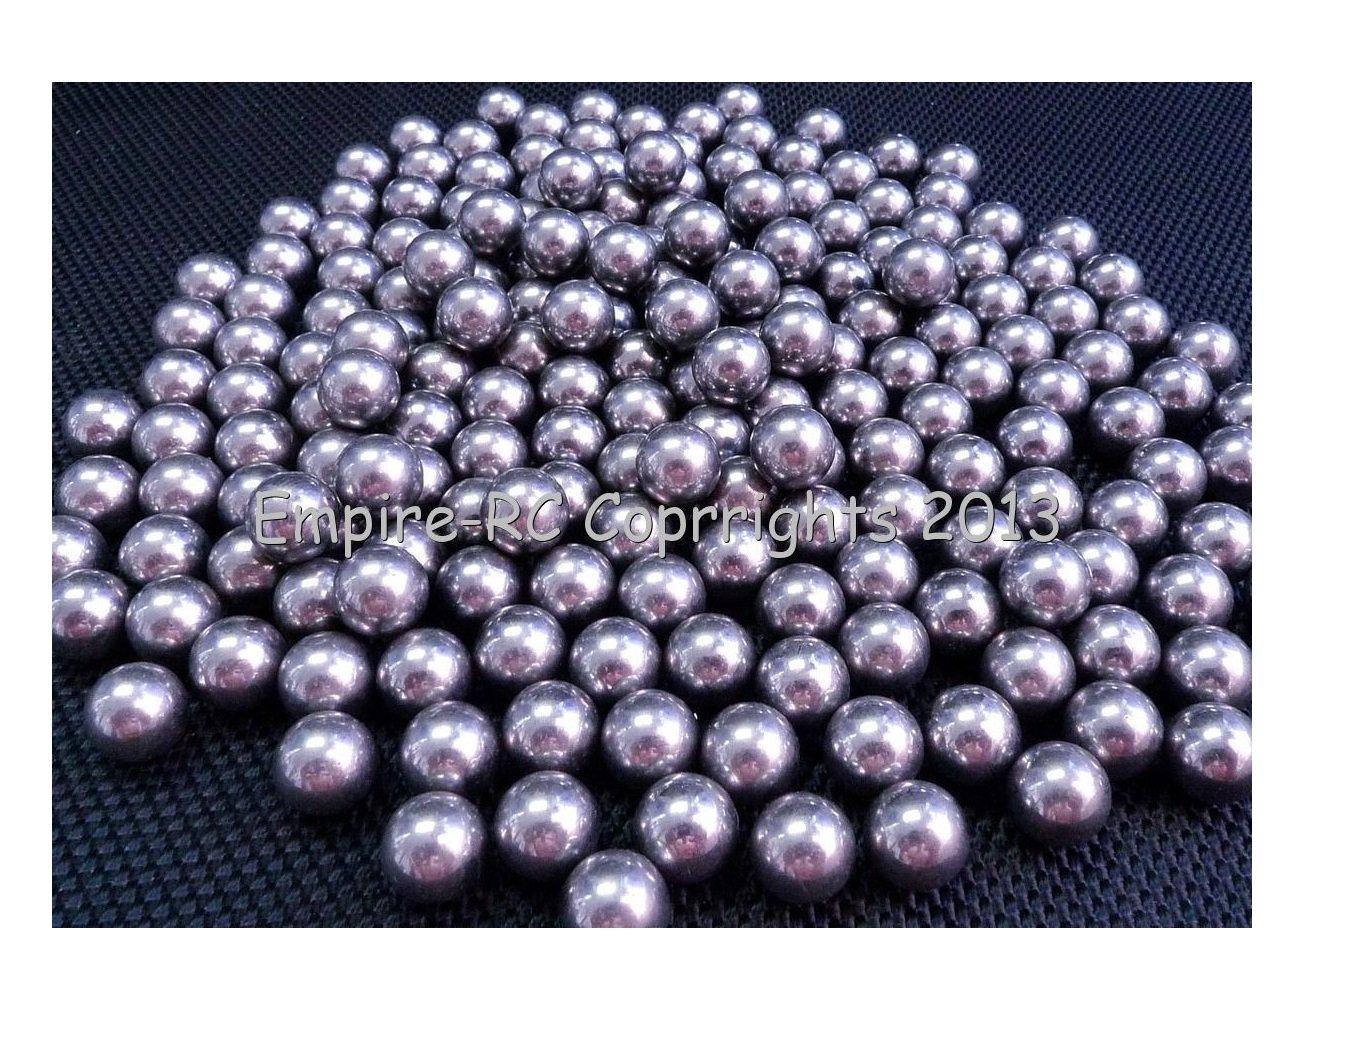 "G10 Hardened Chrome Steel Loose Bearing Balls 1//8/"" inch 100 PCS 3.175mm"